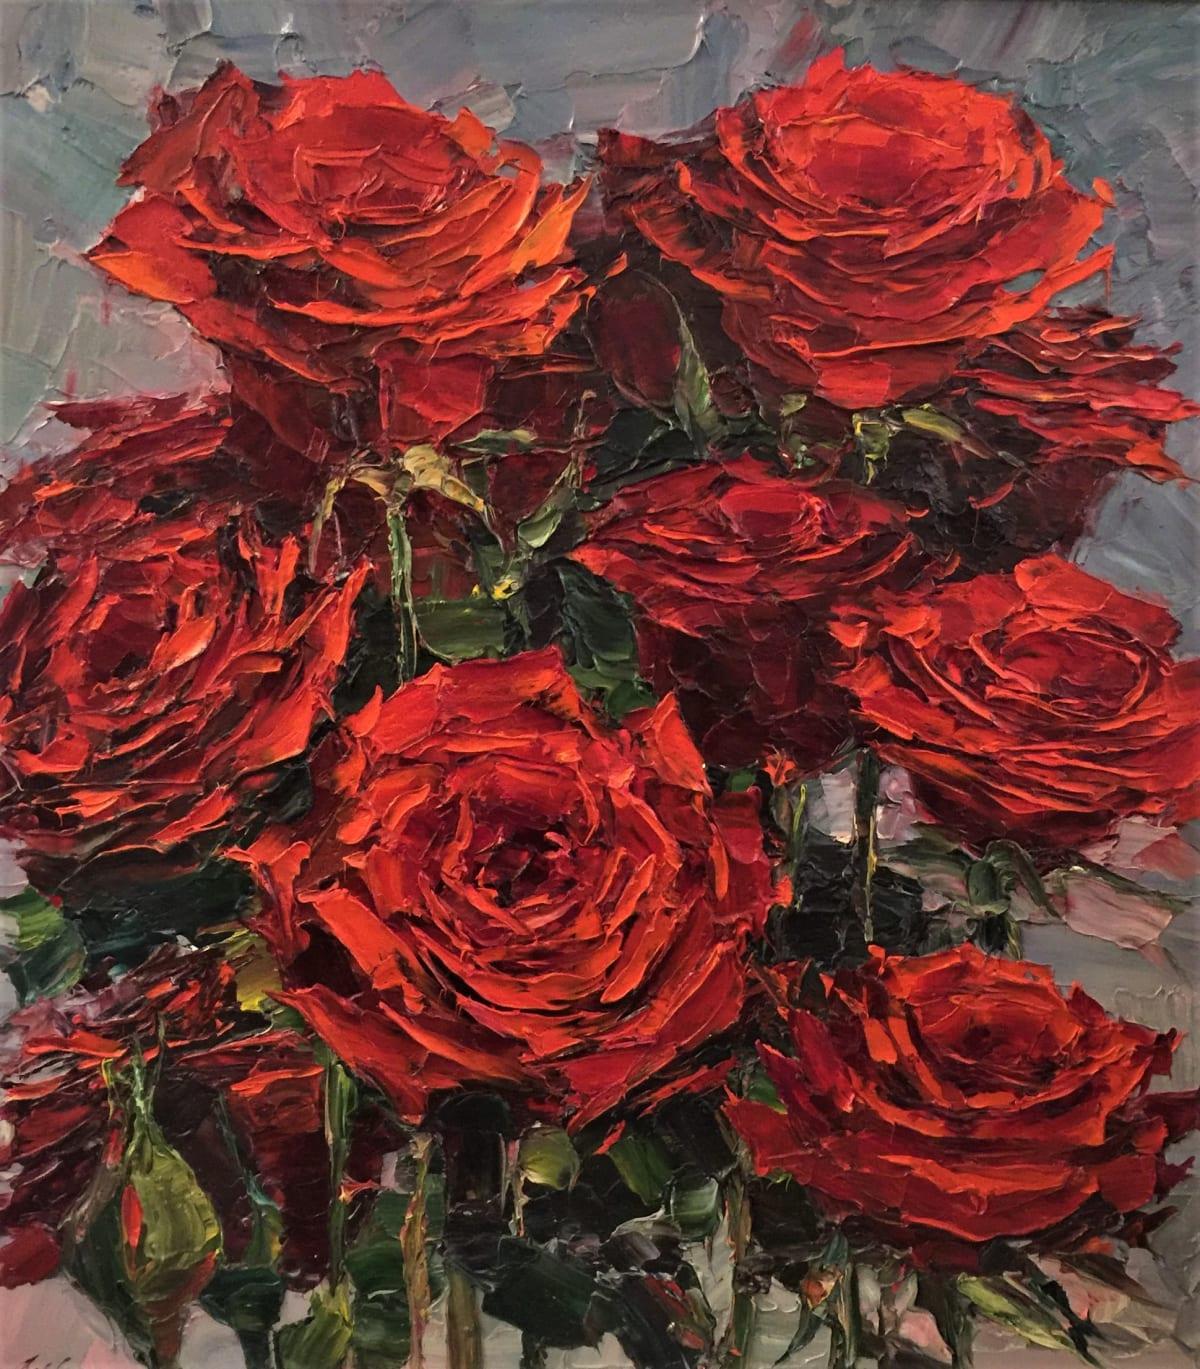 Lana Okiro, Red Roses